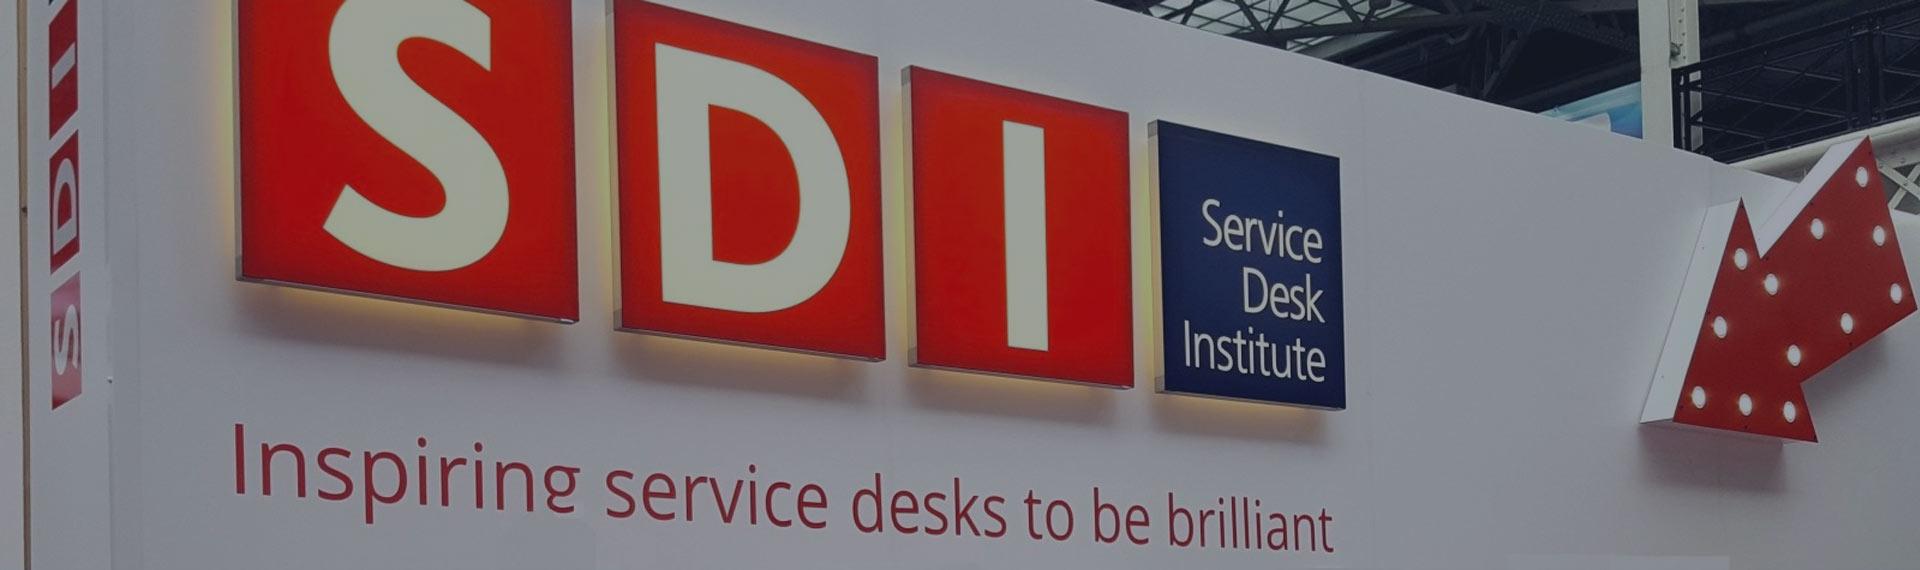 service-desk-institute